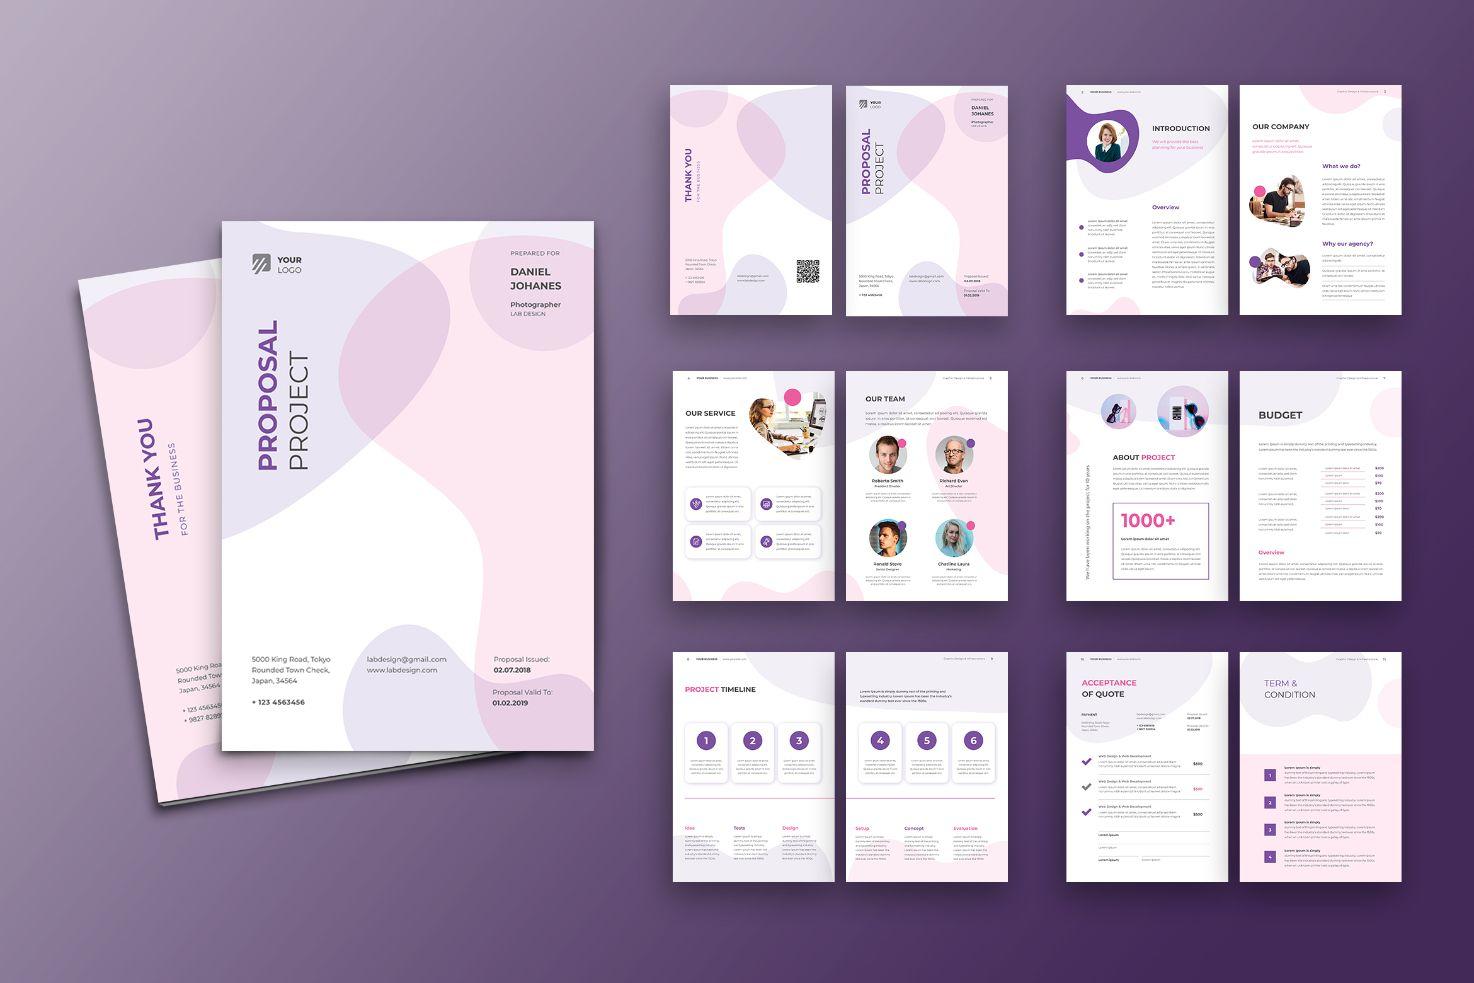 Proposal Digital Concept Corporate Identity Template